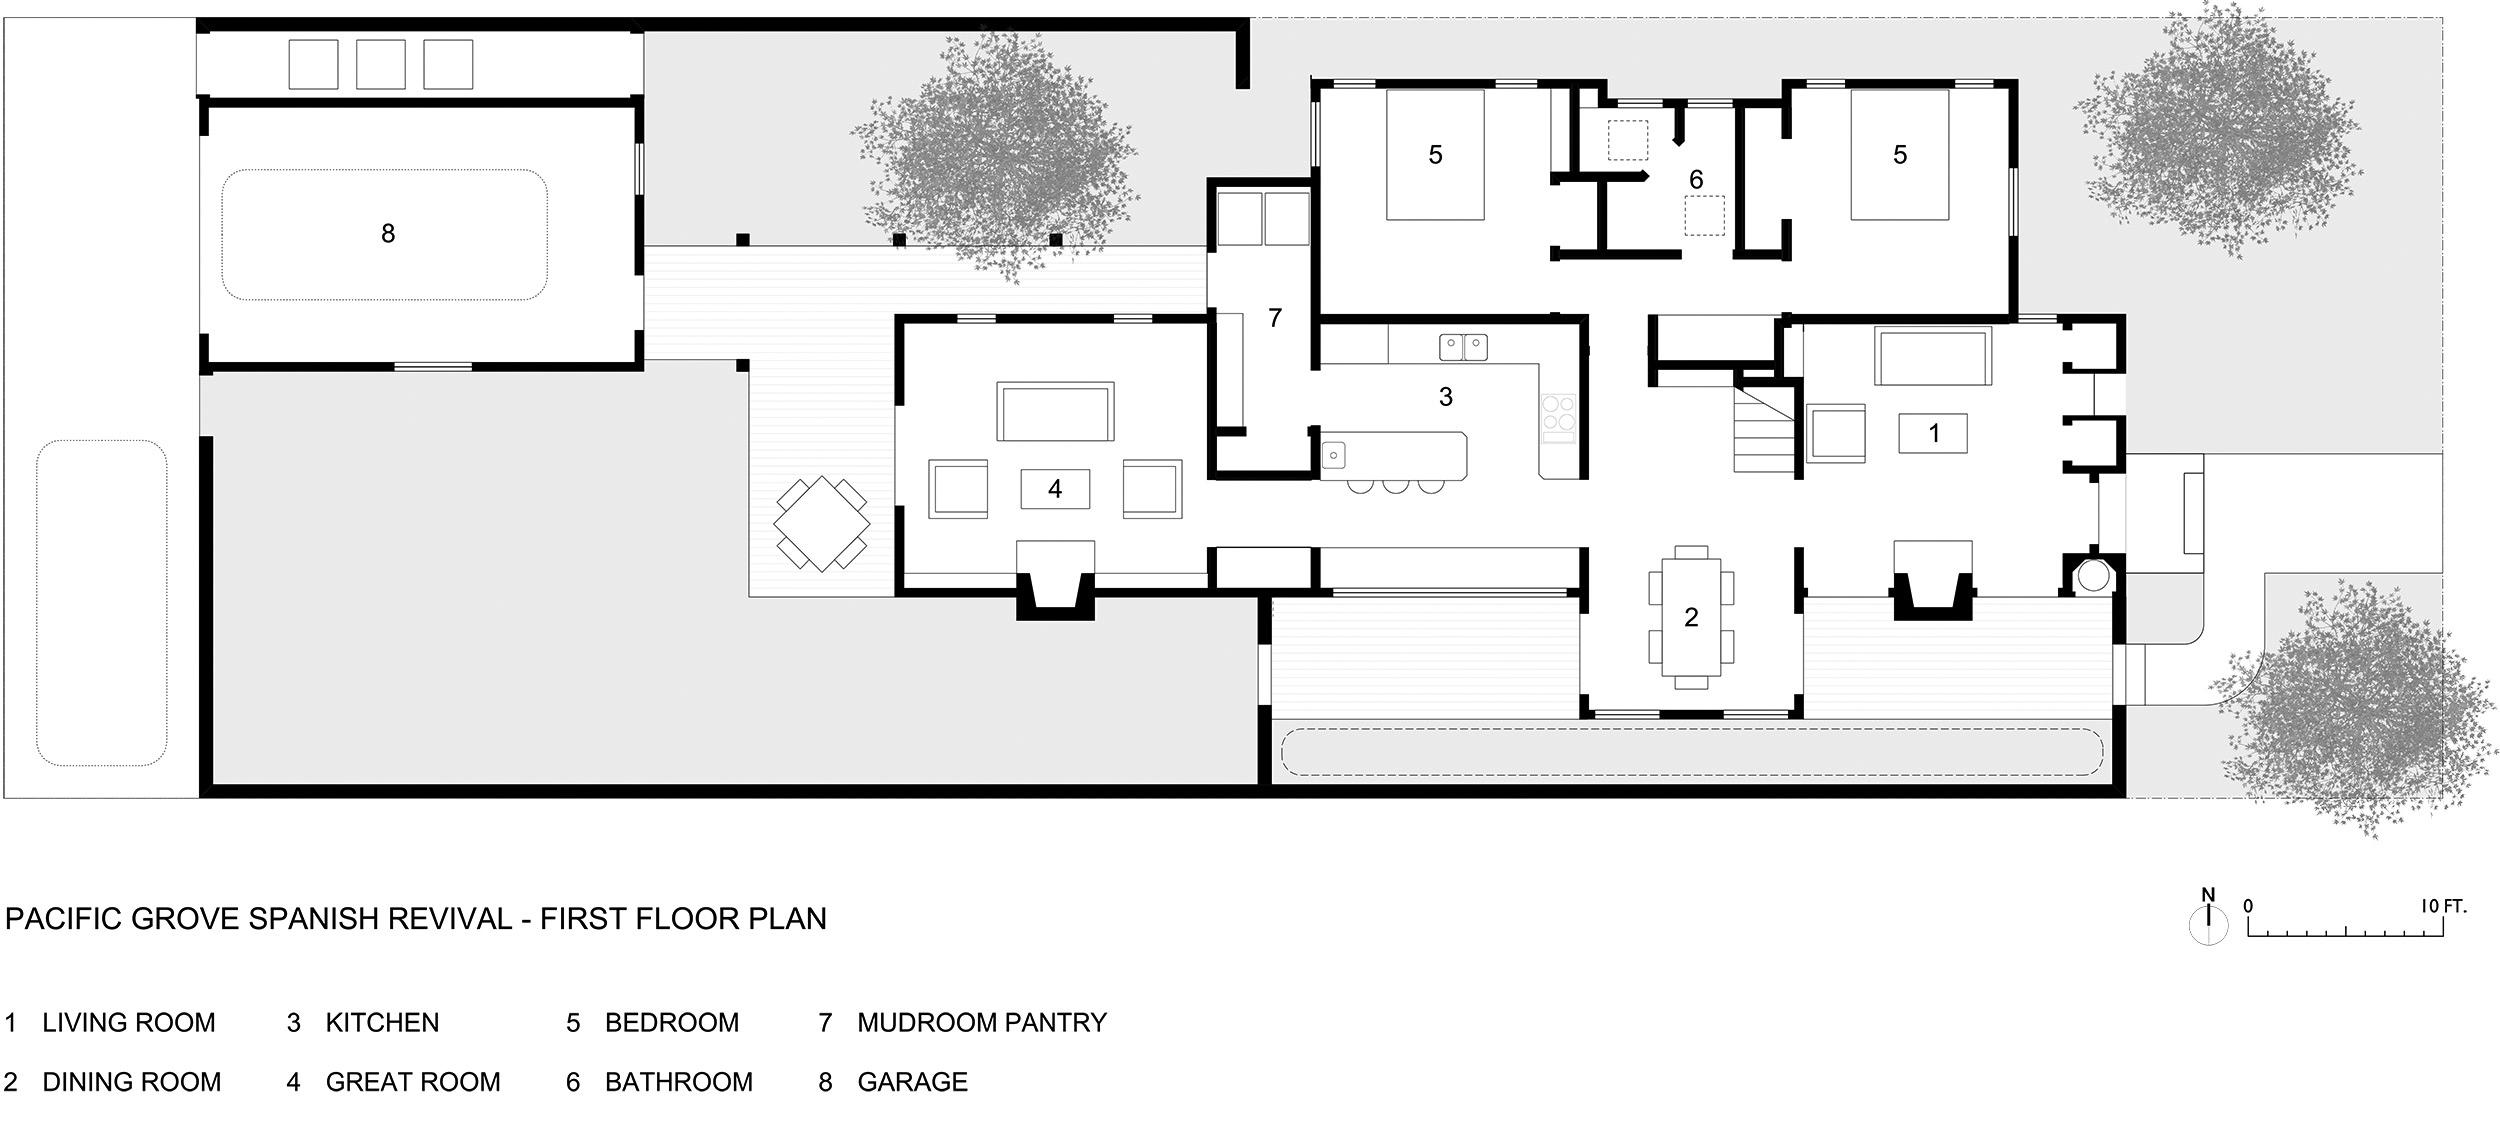 PG Spanish Revival Nolan-floor-plan-website-1.jpg